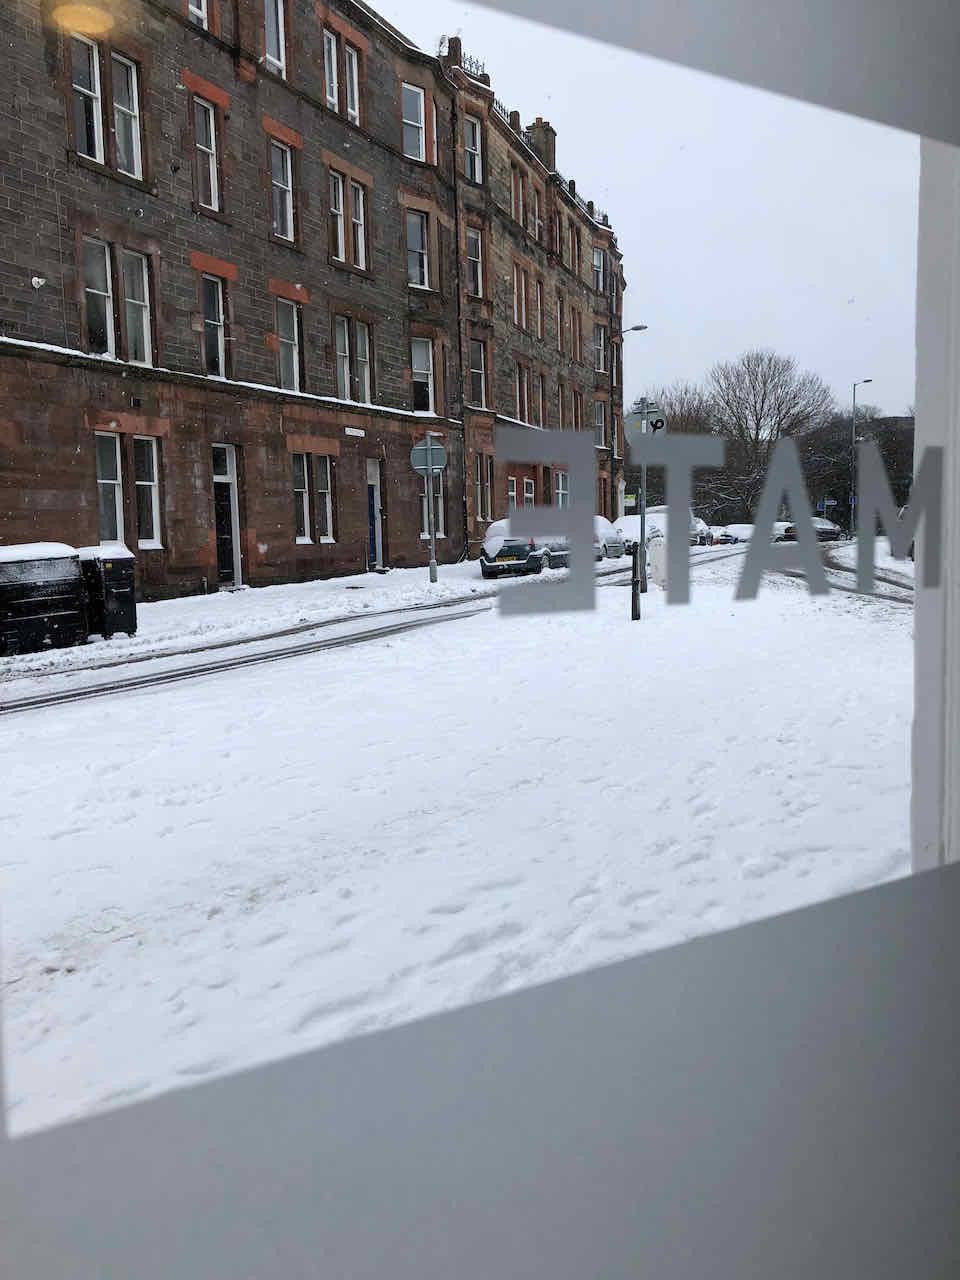 Snowy Primate office